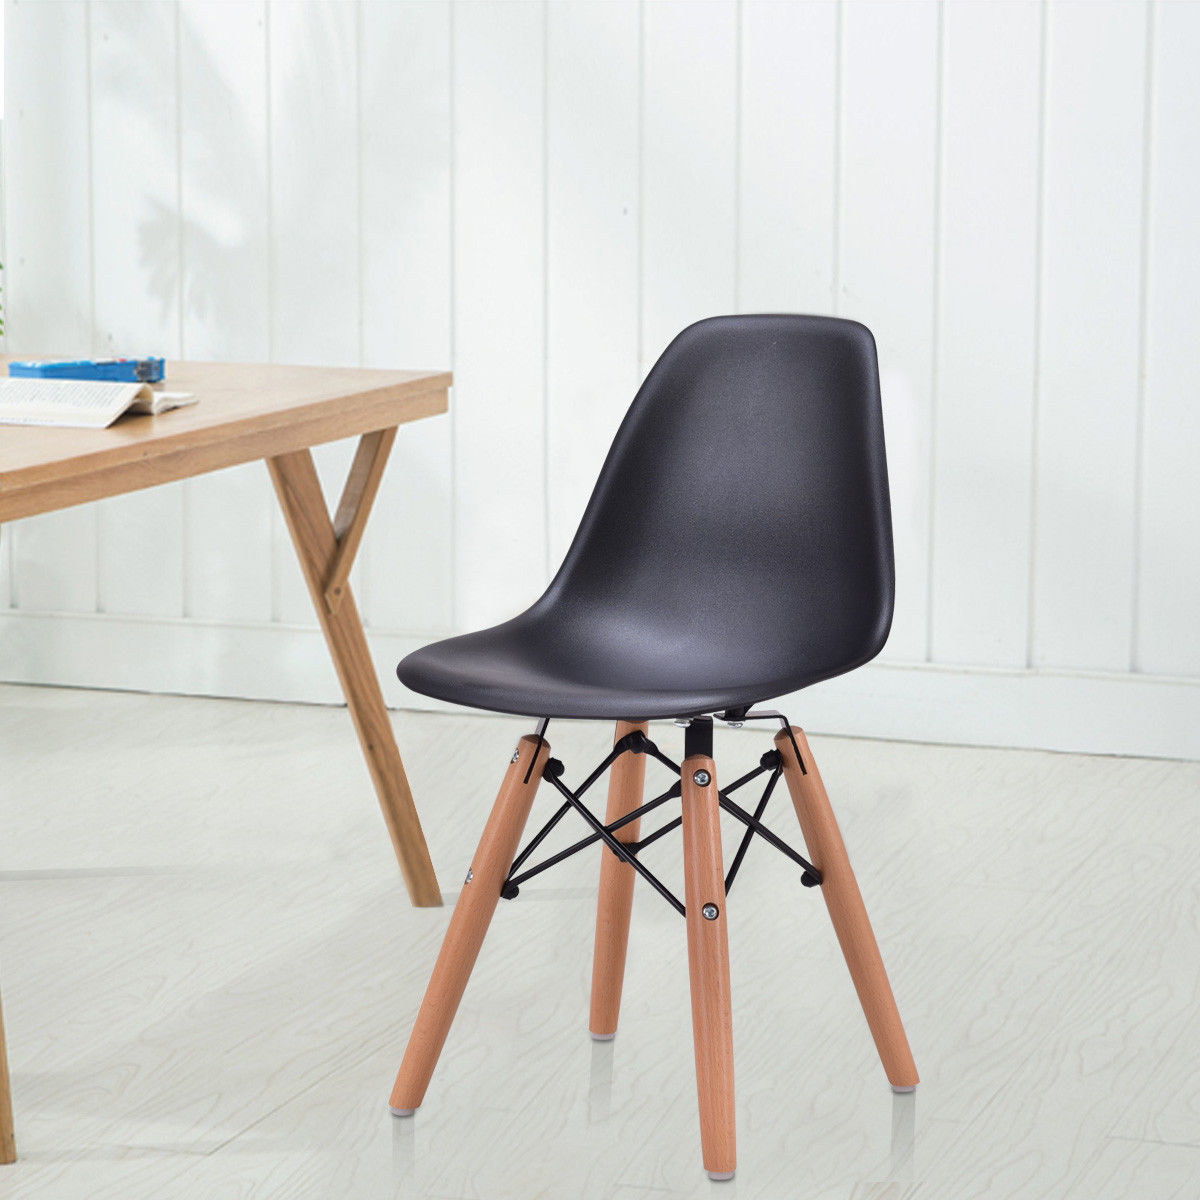 Giantex Modern Kids Dining Chair Children Side Armless Chair Molded Plastic Seat Wood Legs Children Furniture HW56499BK